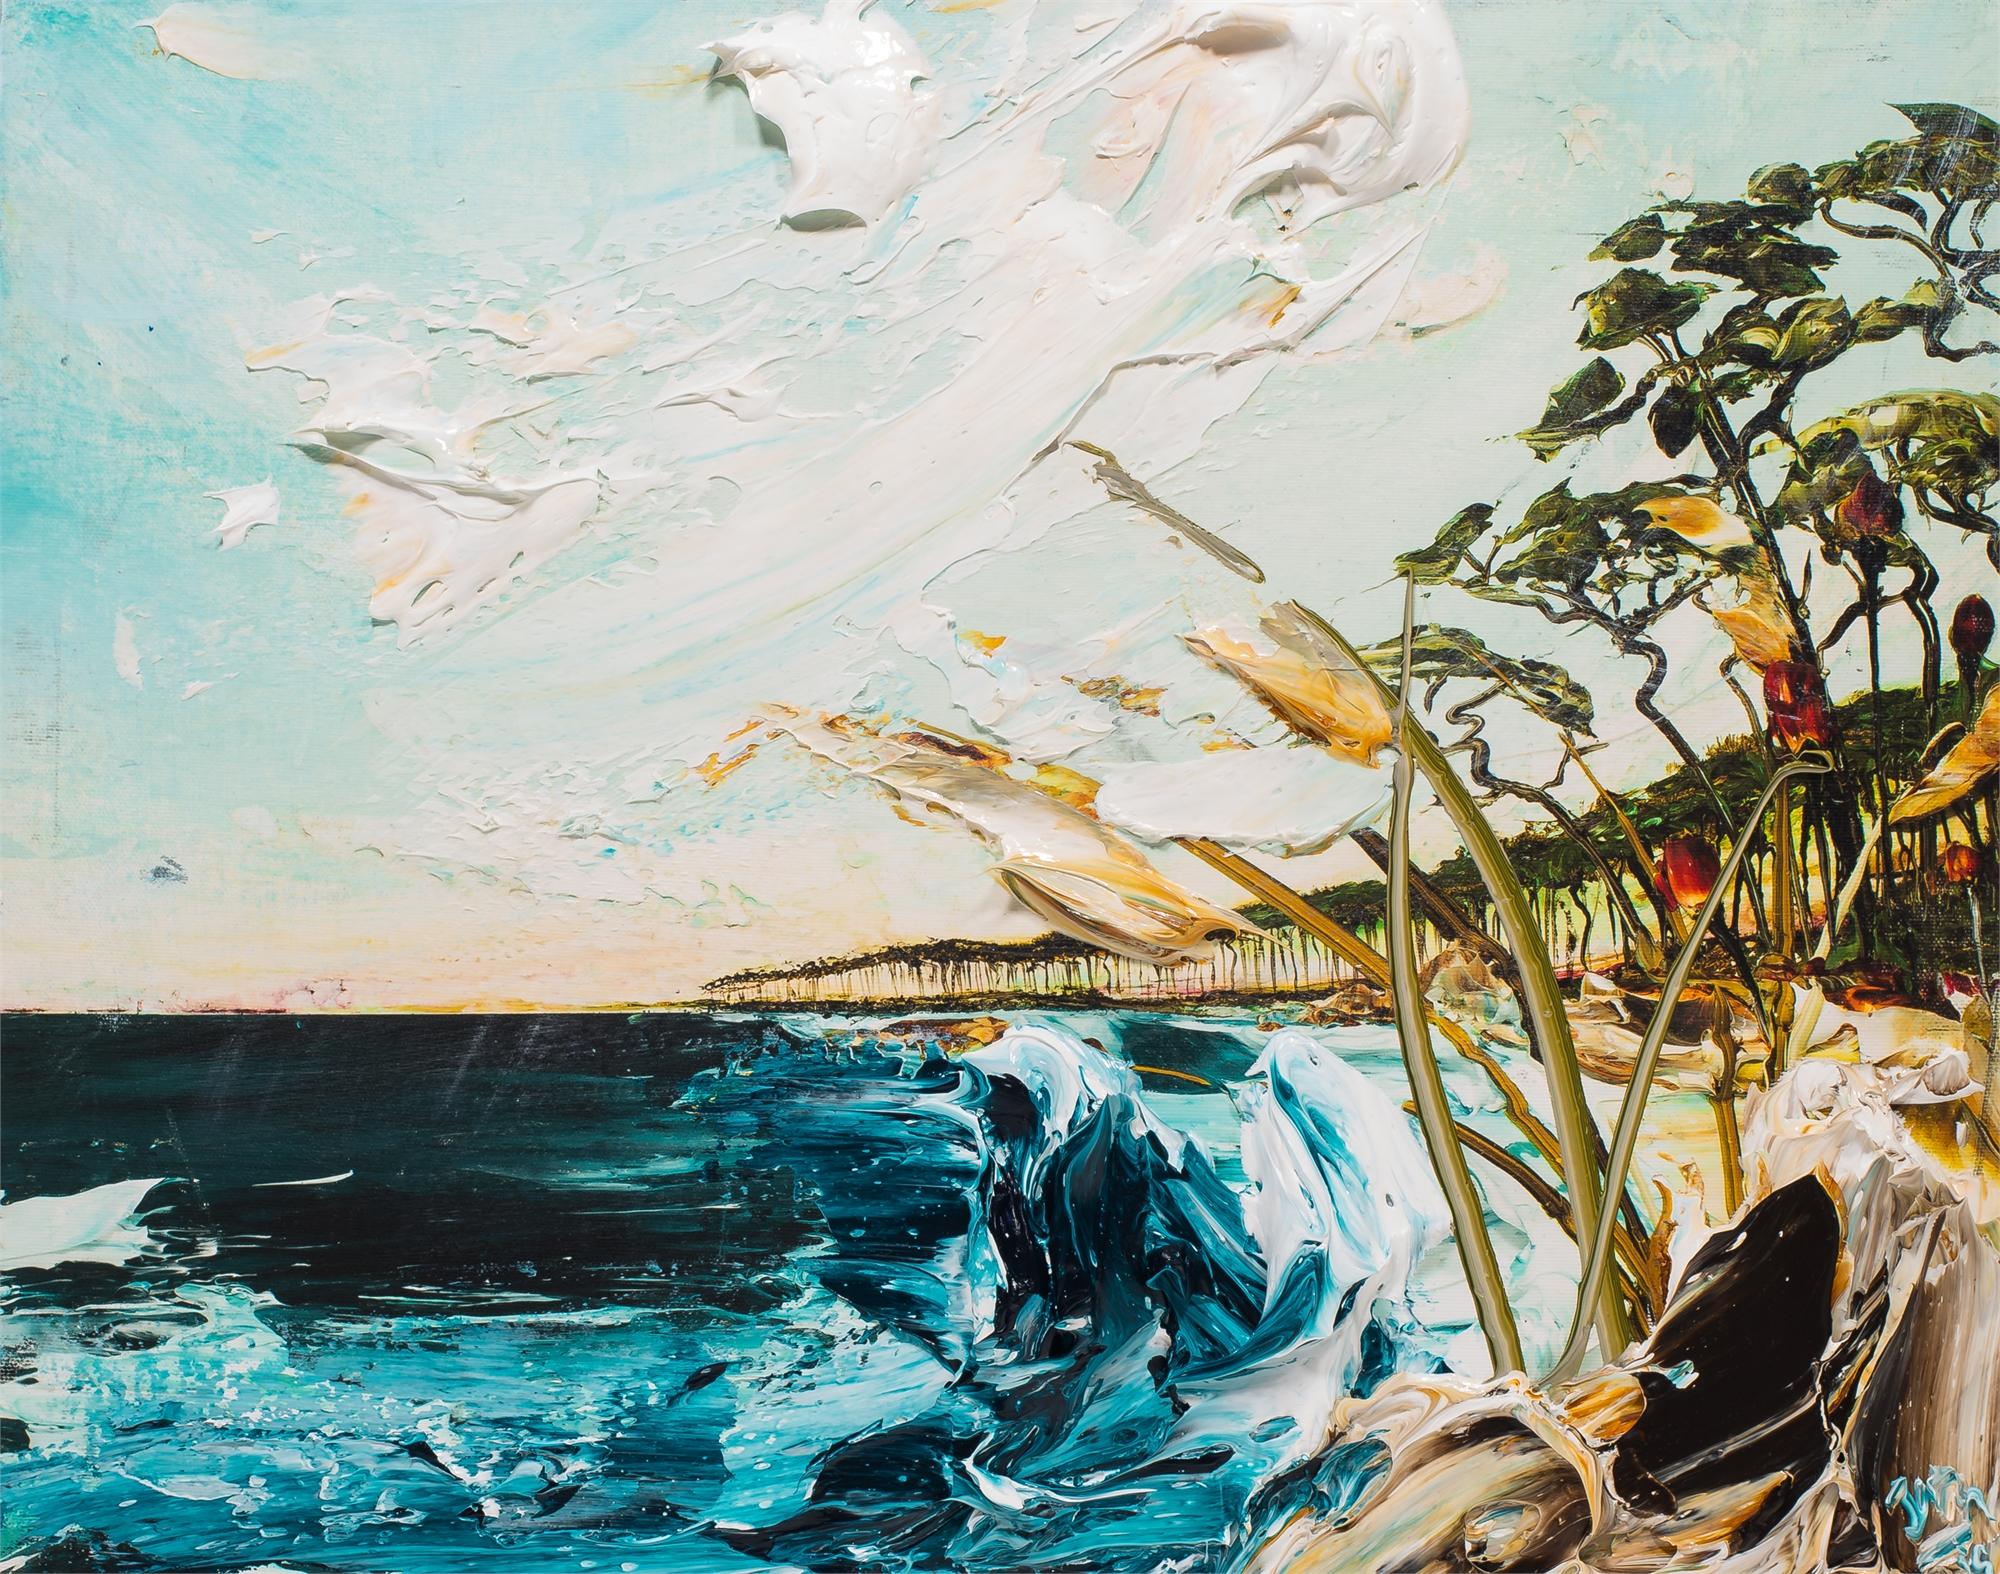 SEASCAPE HPAE 15/50 by Justin Gaffrey